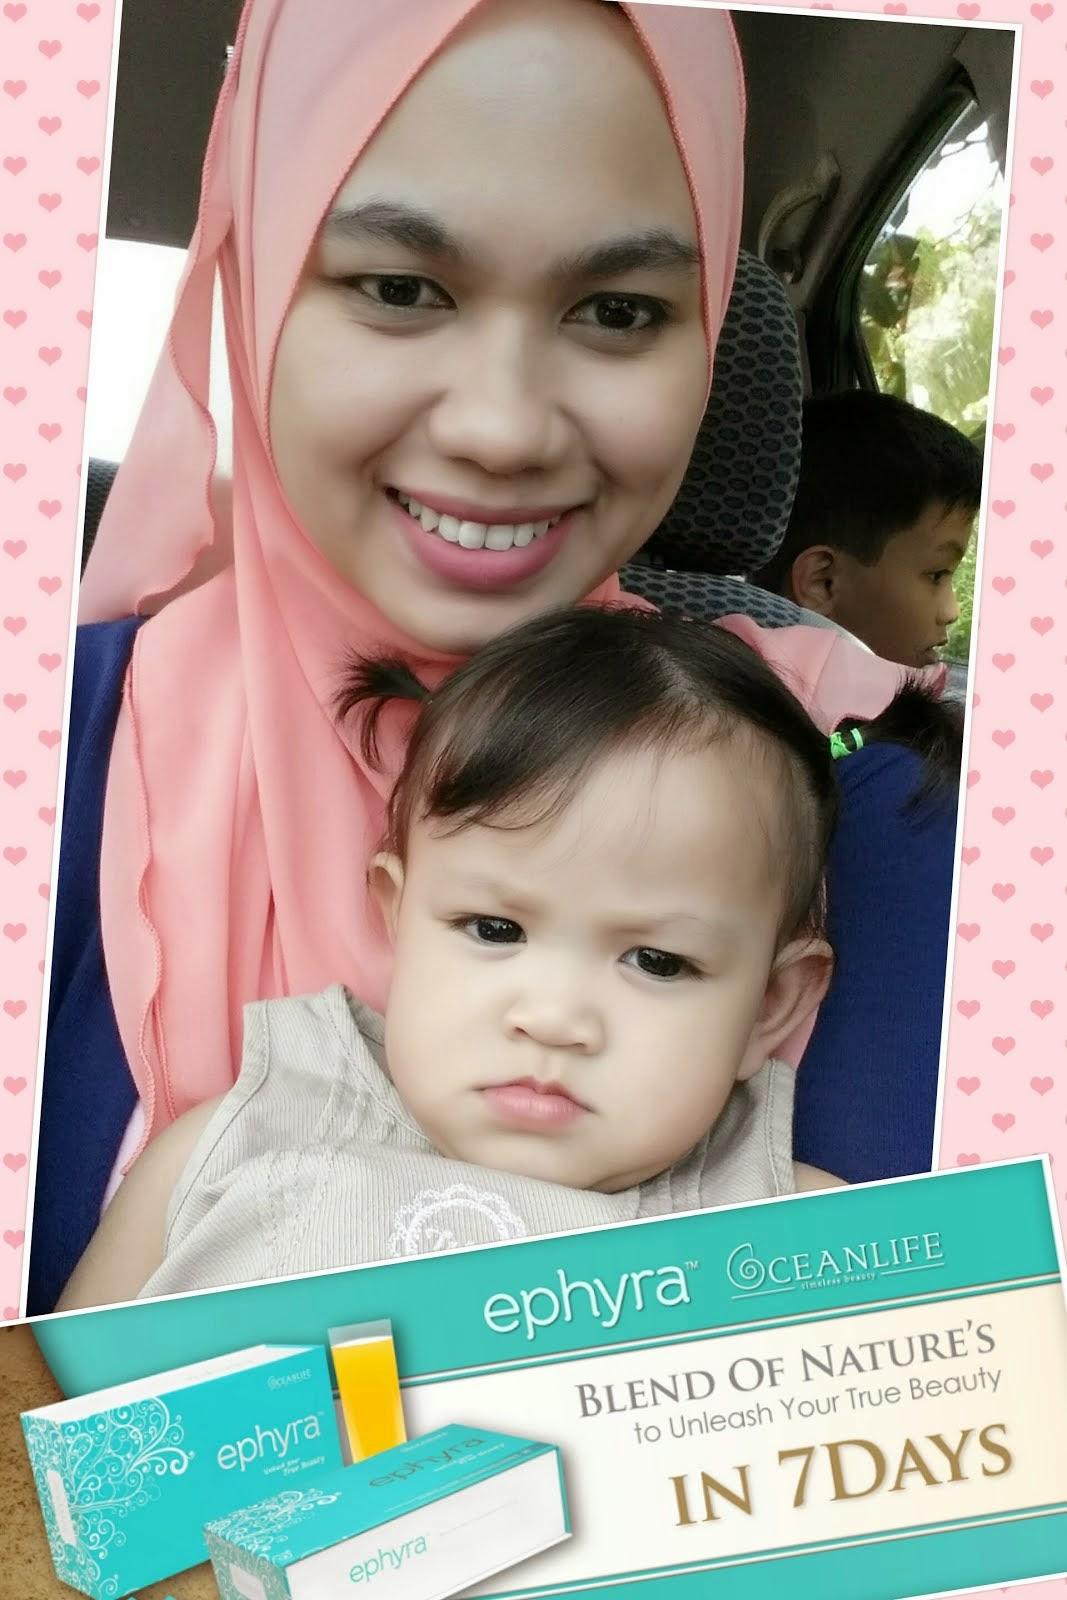 EPHYRA Dealer Putrajaya